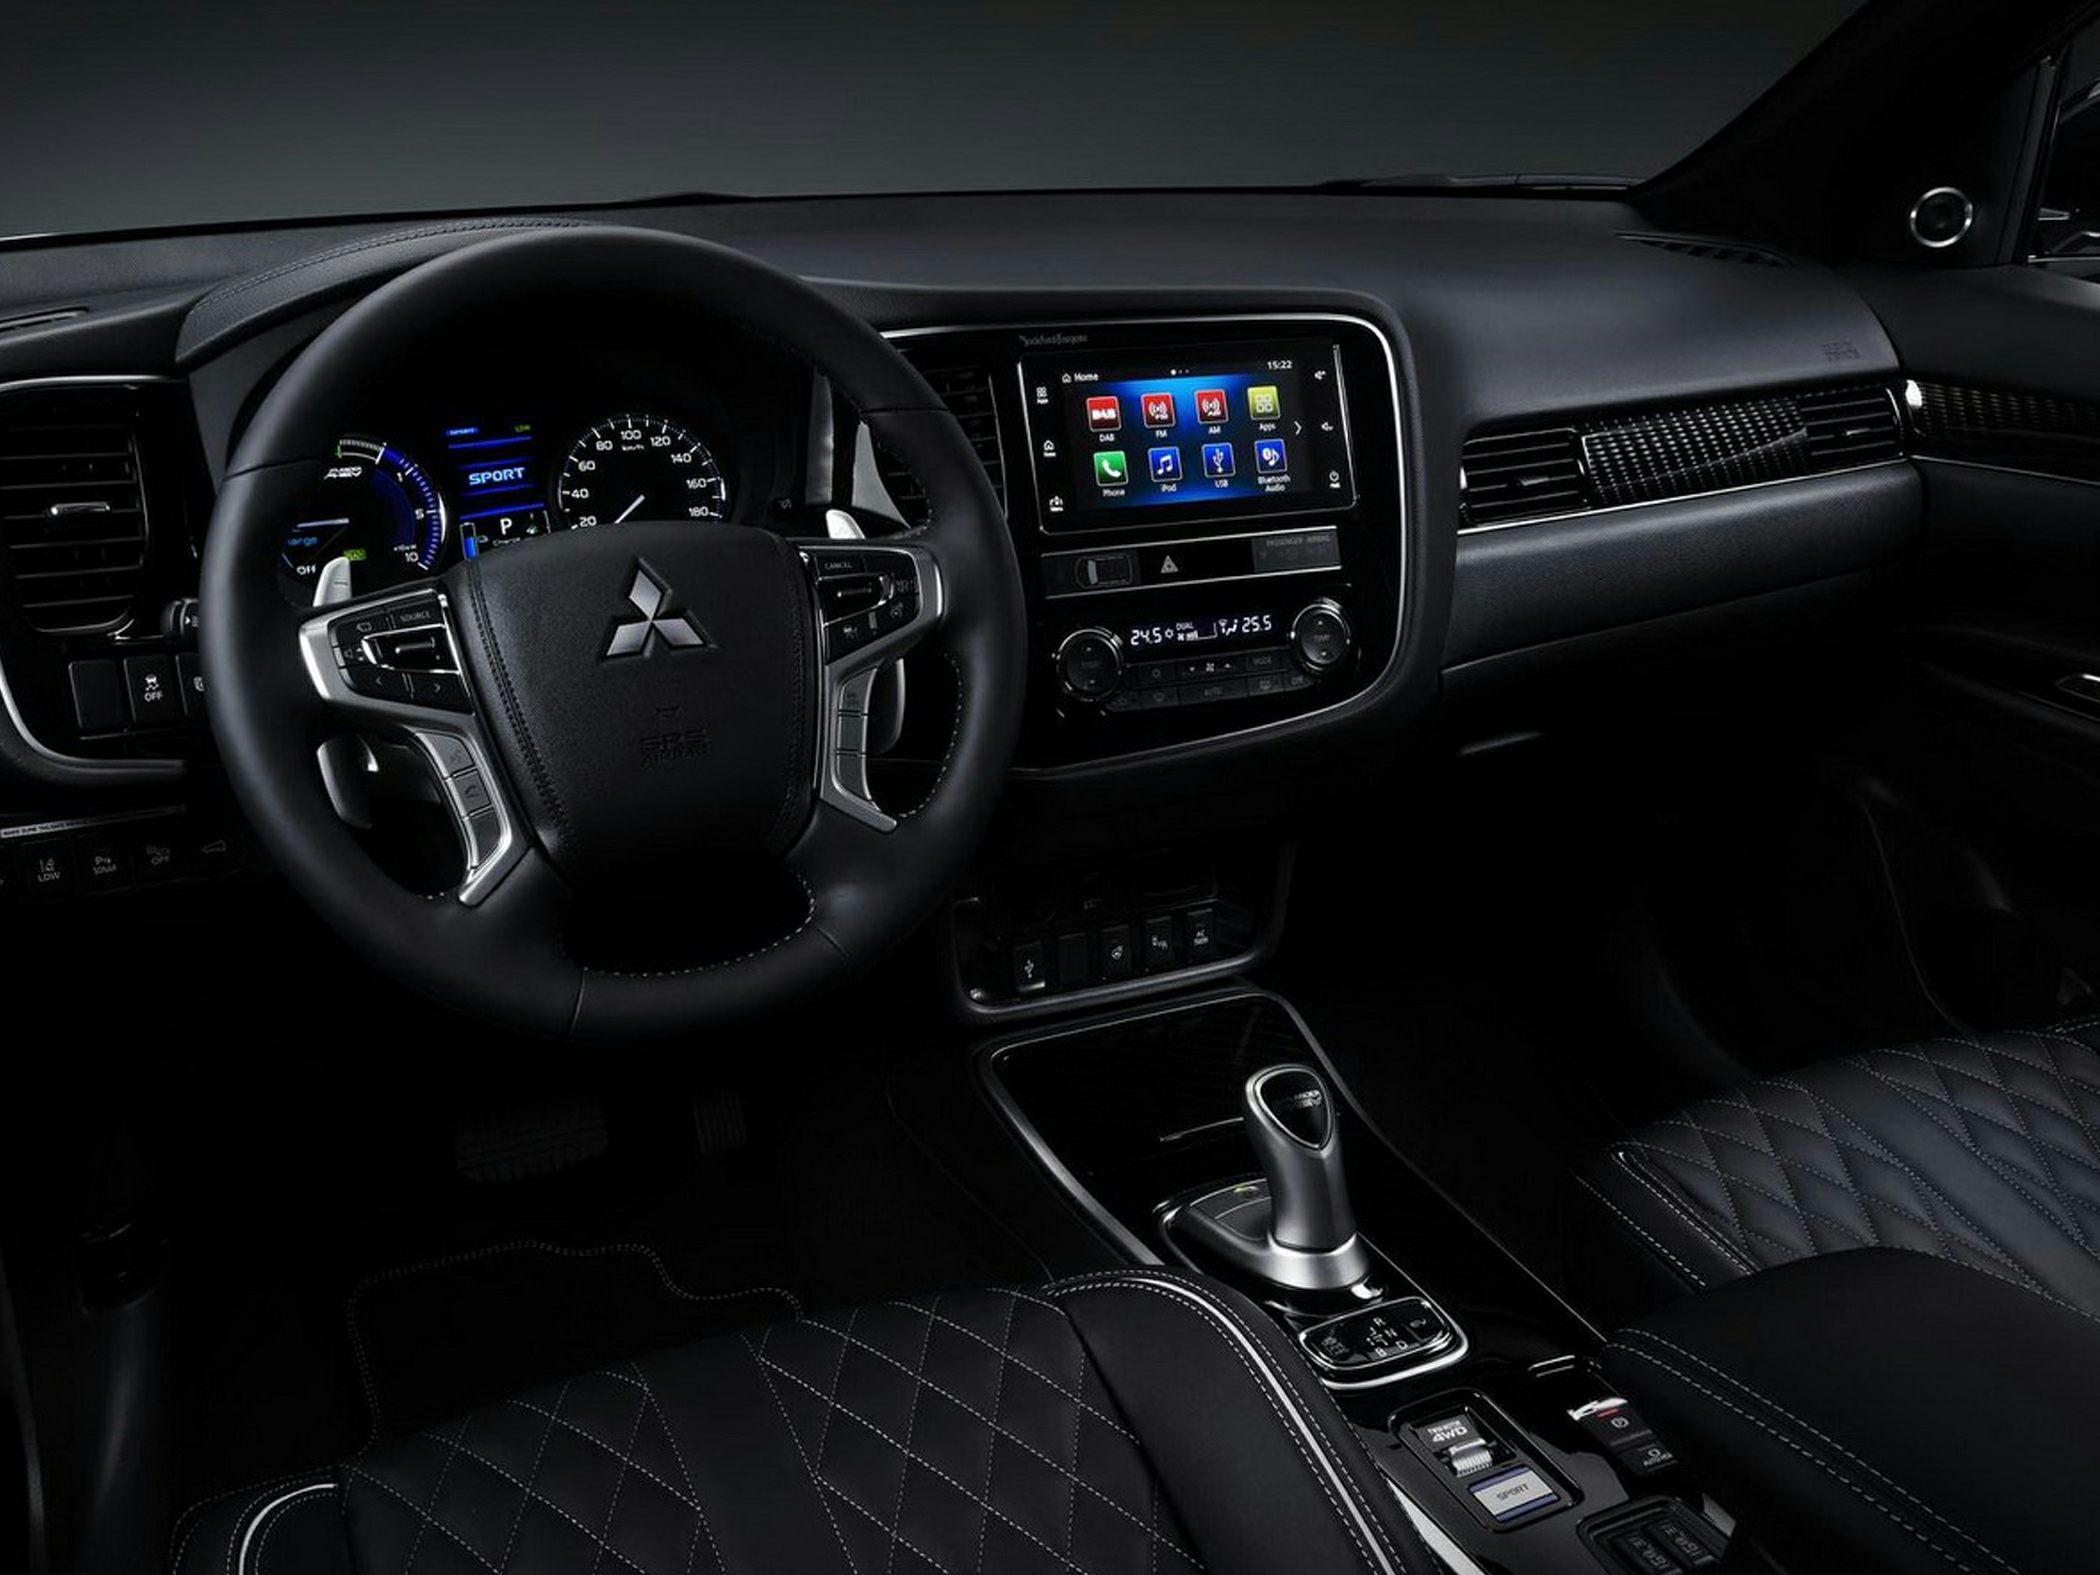 2019 Mitsubishi Outlander PHEV Deals, Prices, Incentives